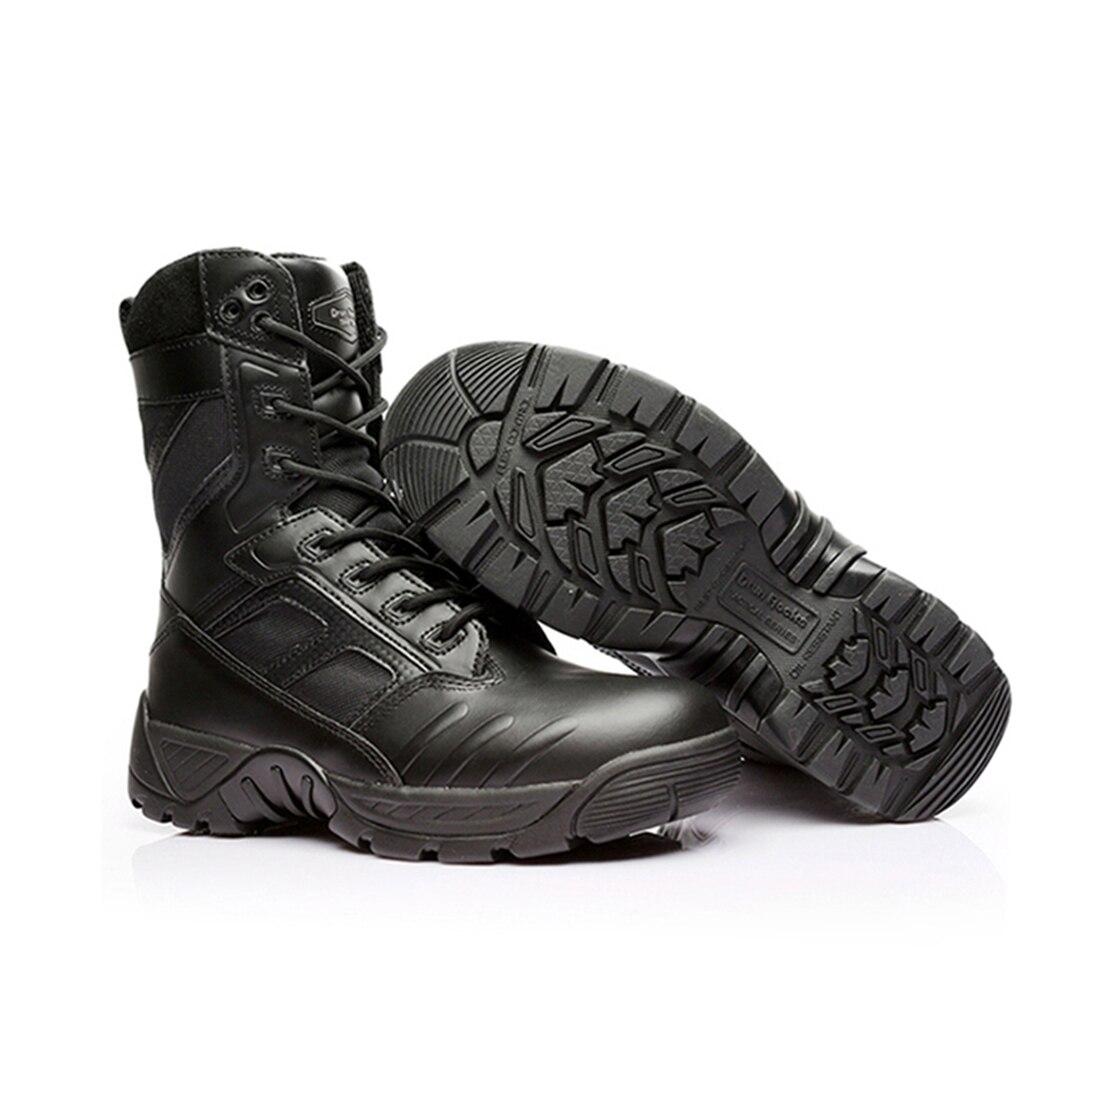 Workerkit Waterproof Puncture-proof Cowhide Tactical Boots Outdoor Hunting Combat Boots for Men